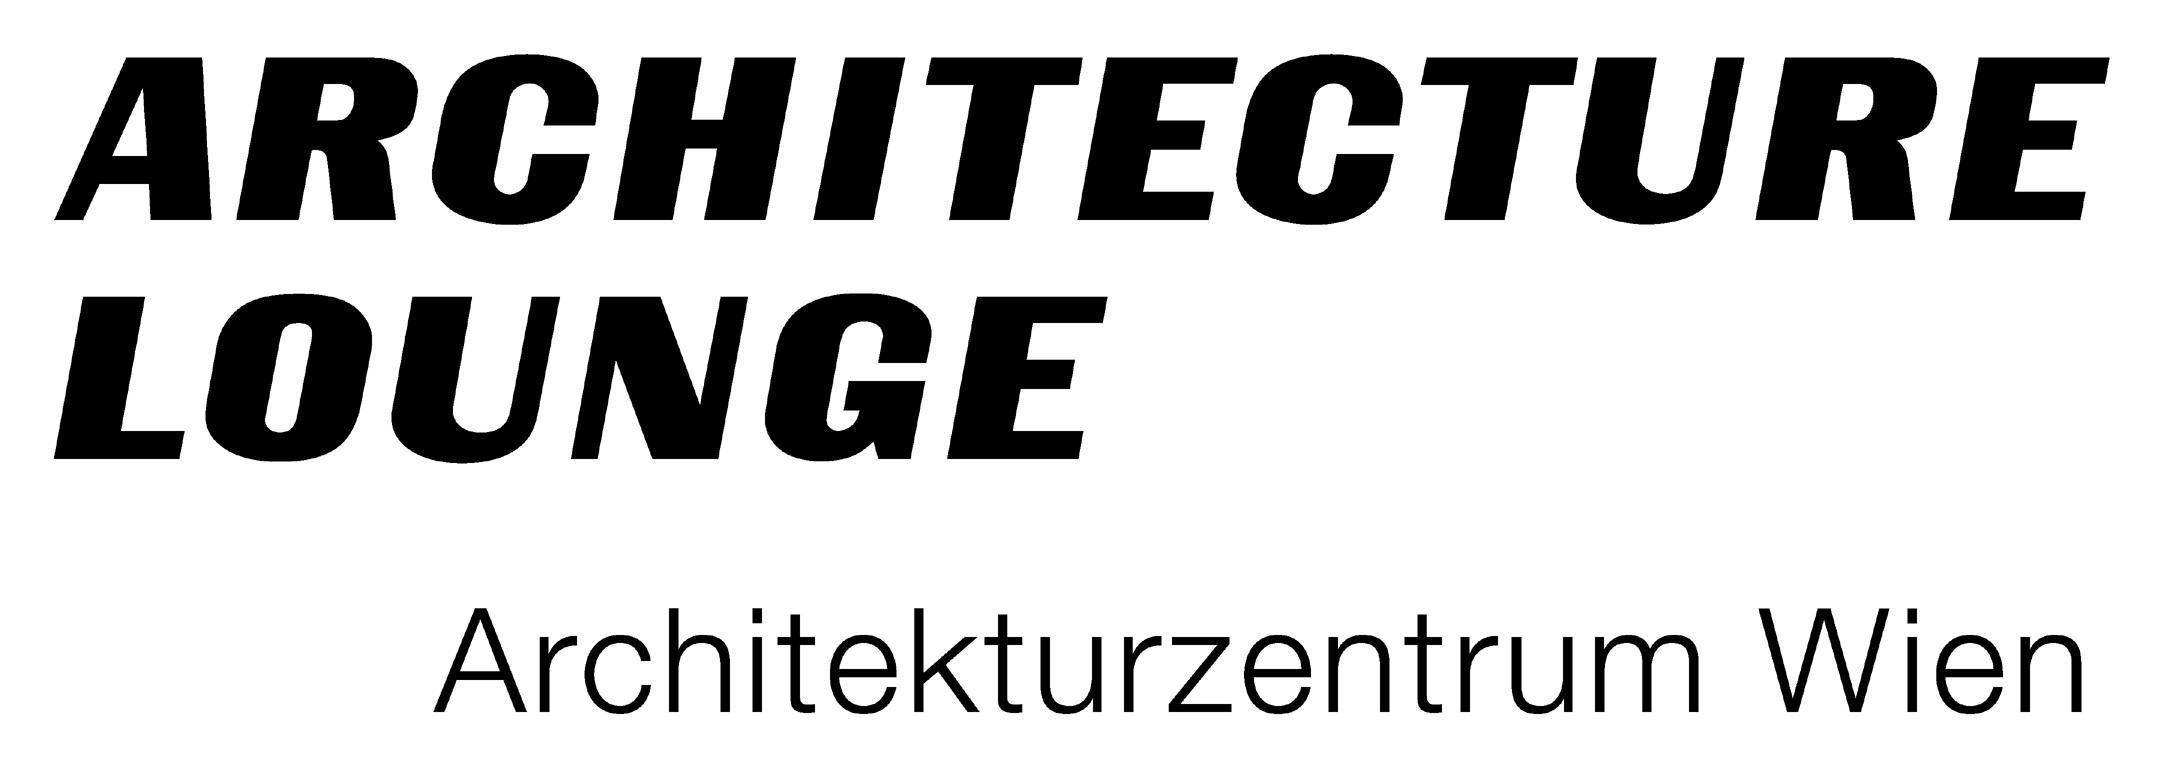 Architecture Lounge